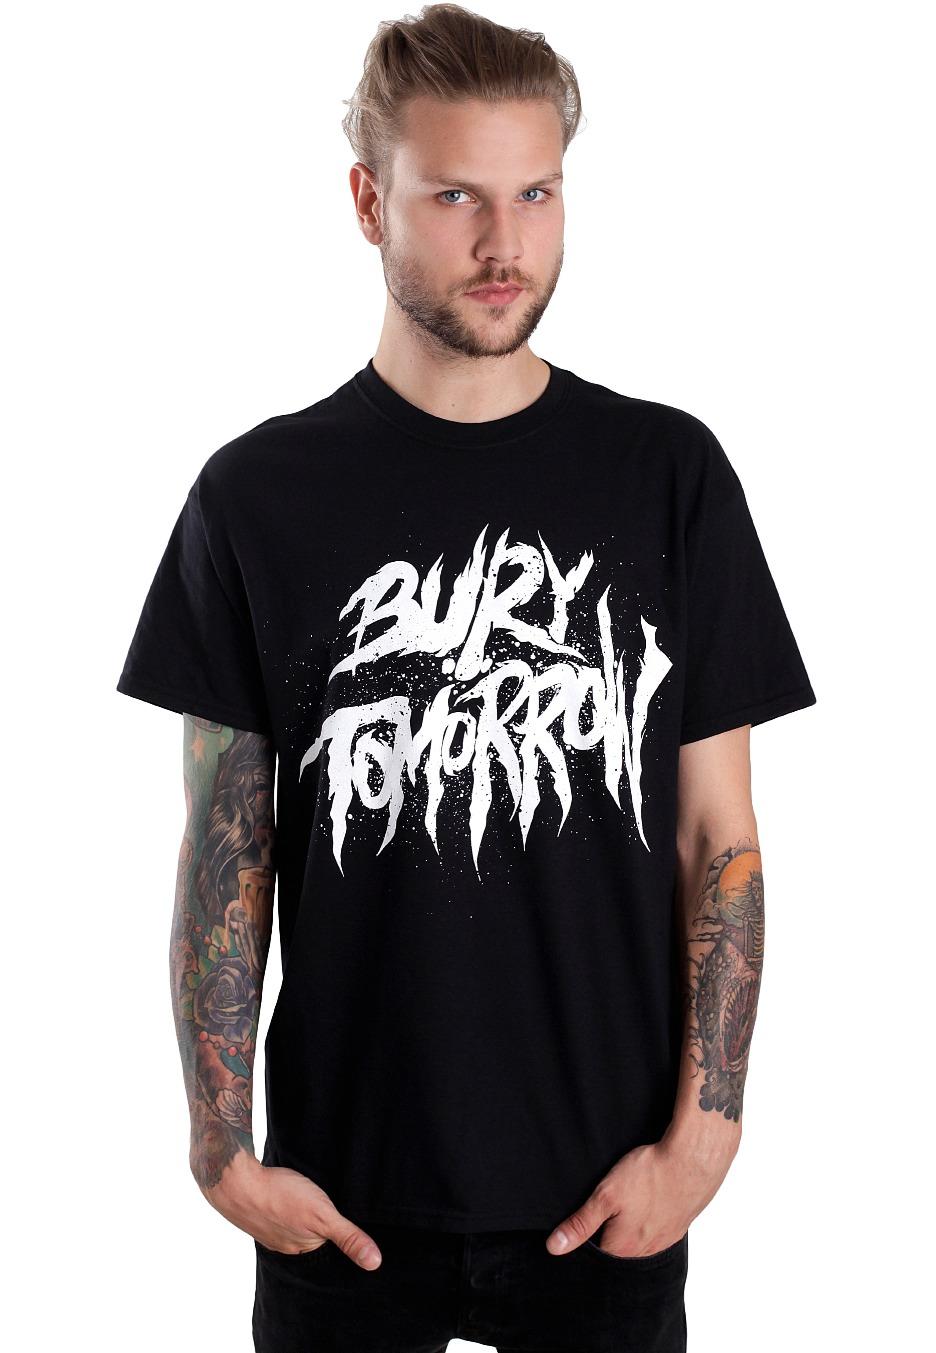 bury tomorrow distressed logo t shirt uk. Black Bedroom Furniture Sets. Home Design Ideas